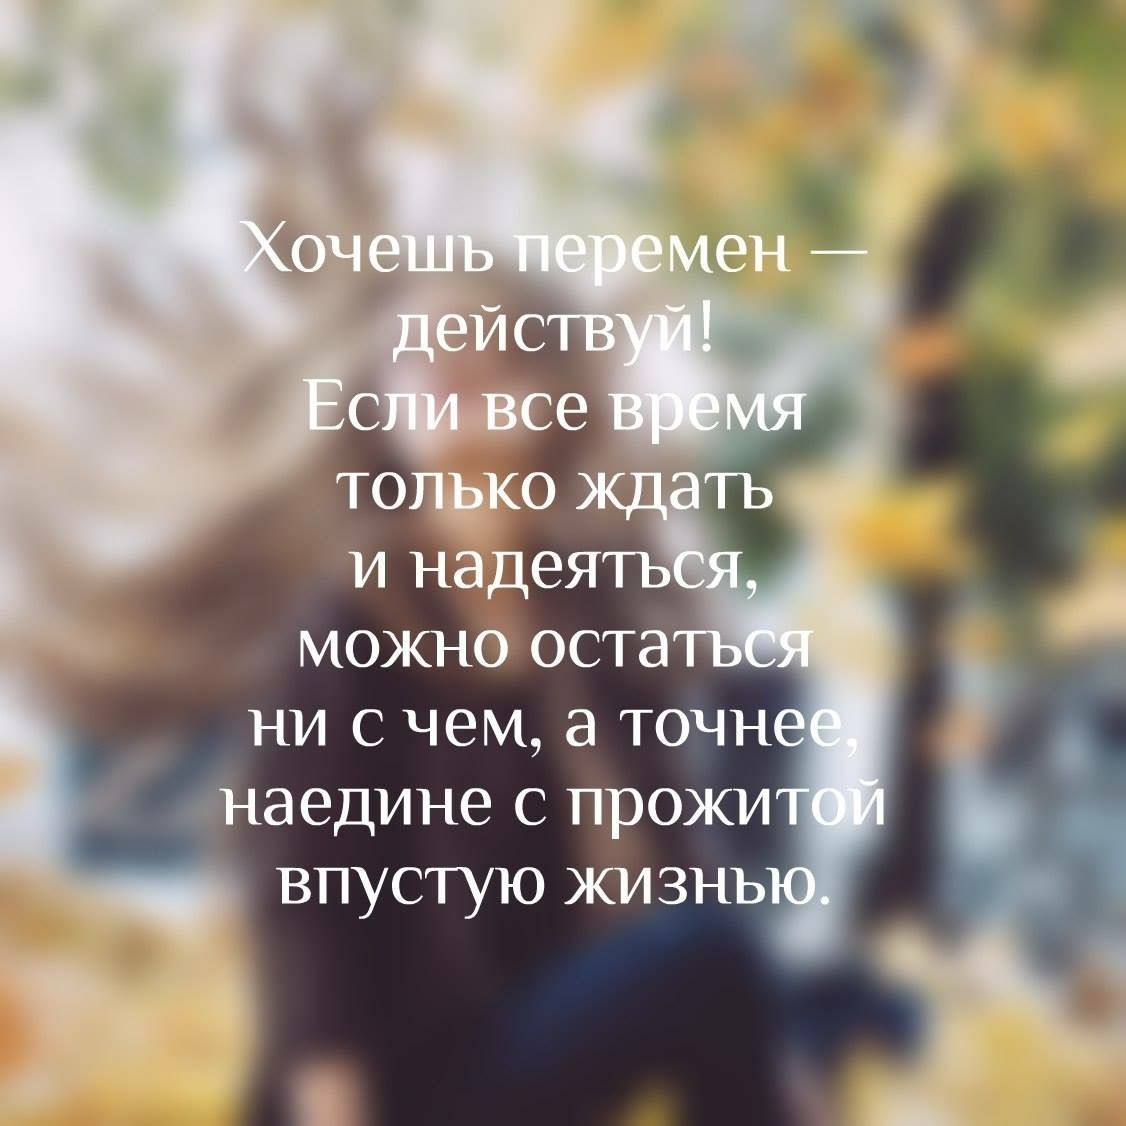 Russian Love Quotes Pinnatasha  On Russian Quotespix  Pinterest  Russian Quotes